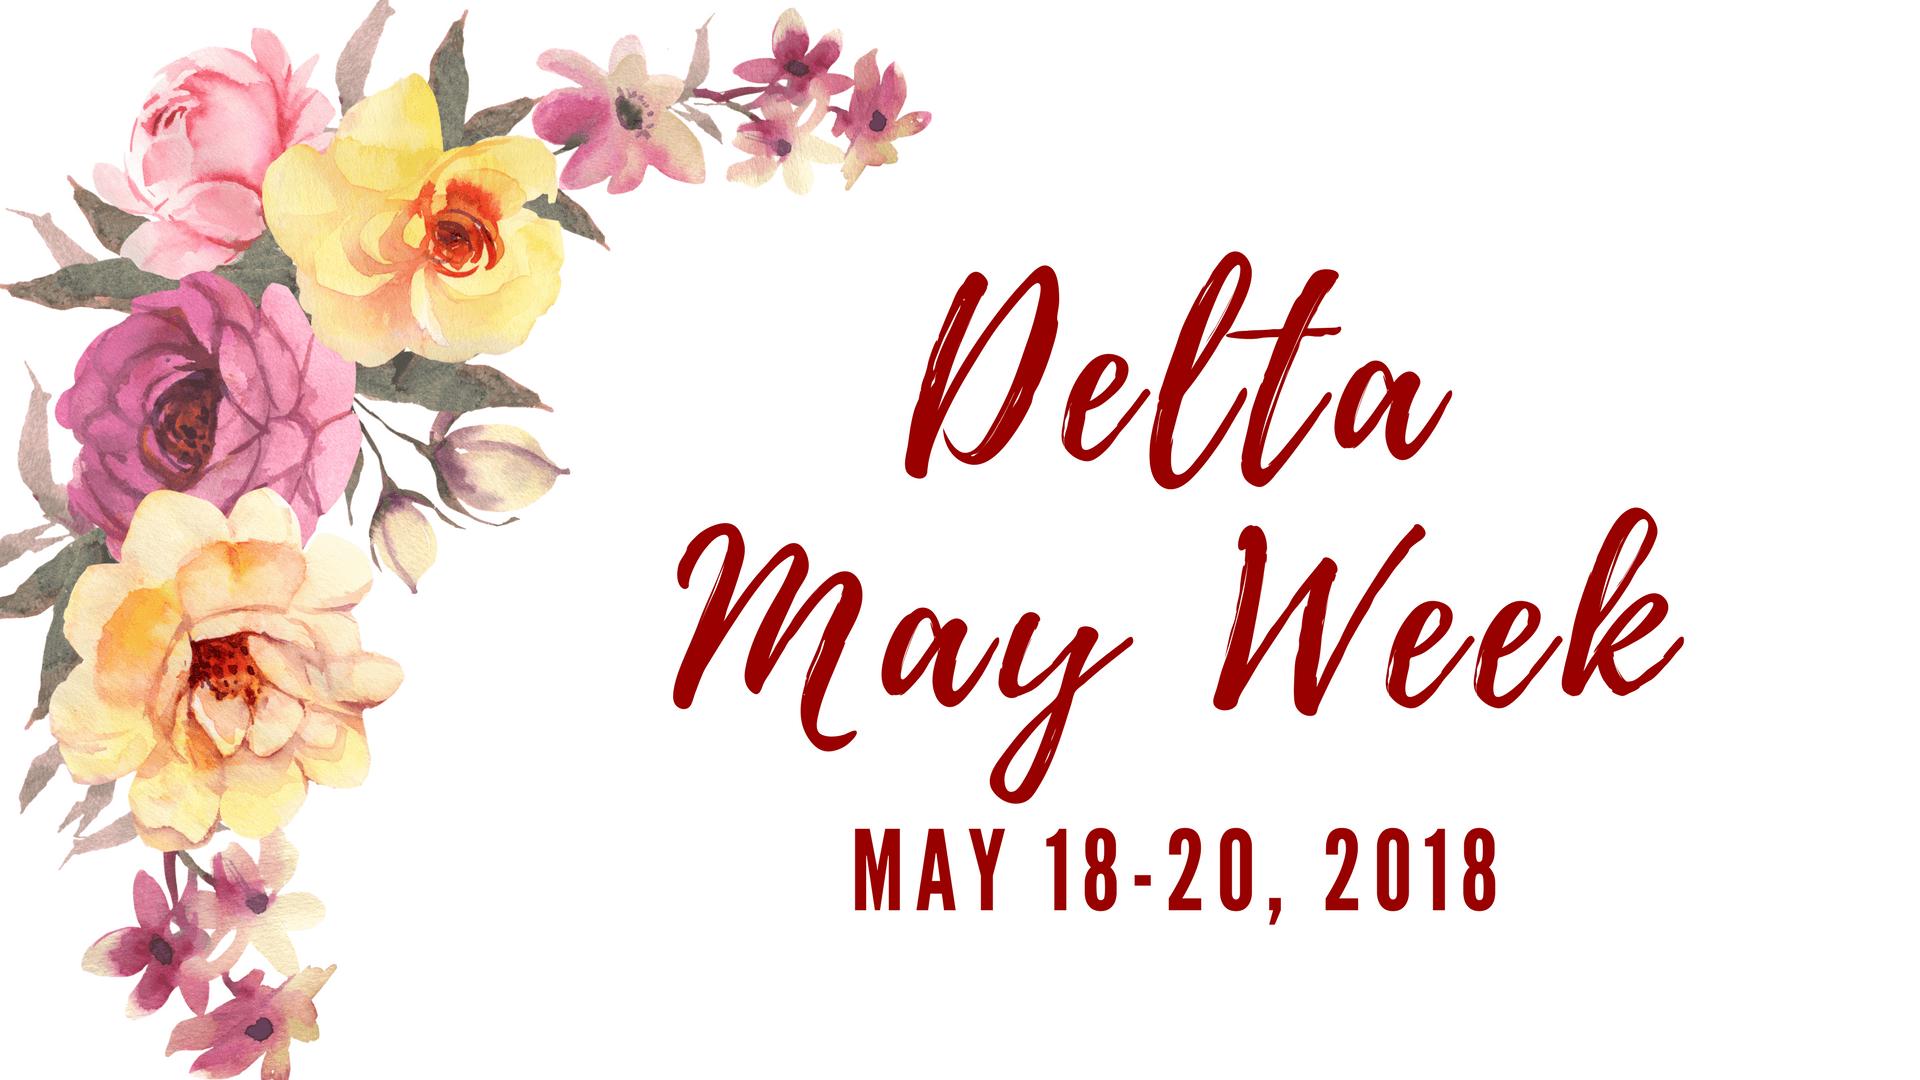 Grand Rapids Alumnae Delta May Week 2018